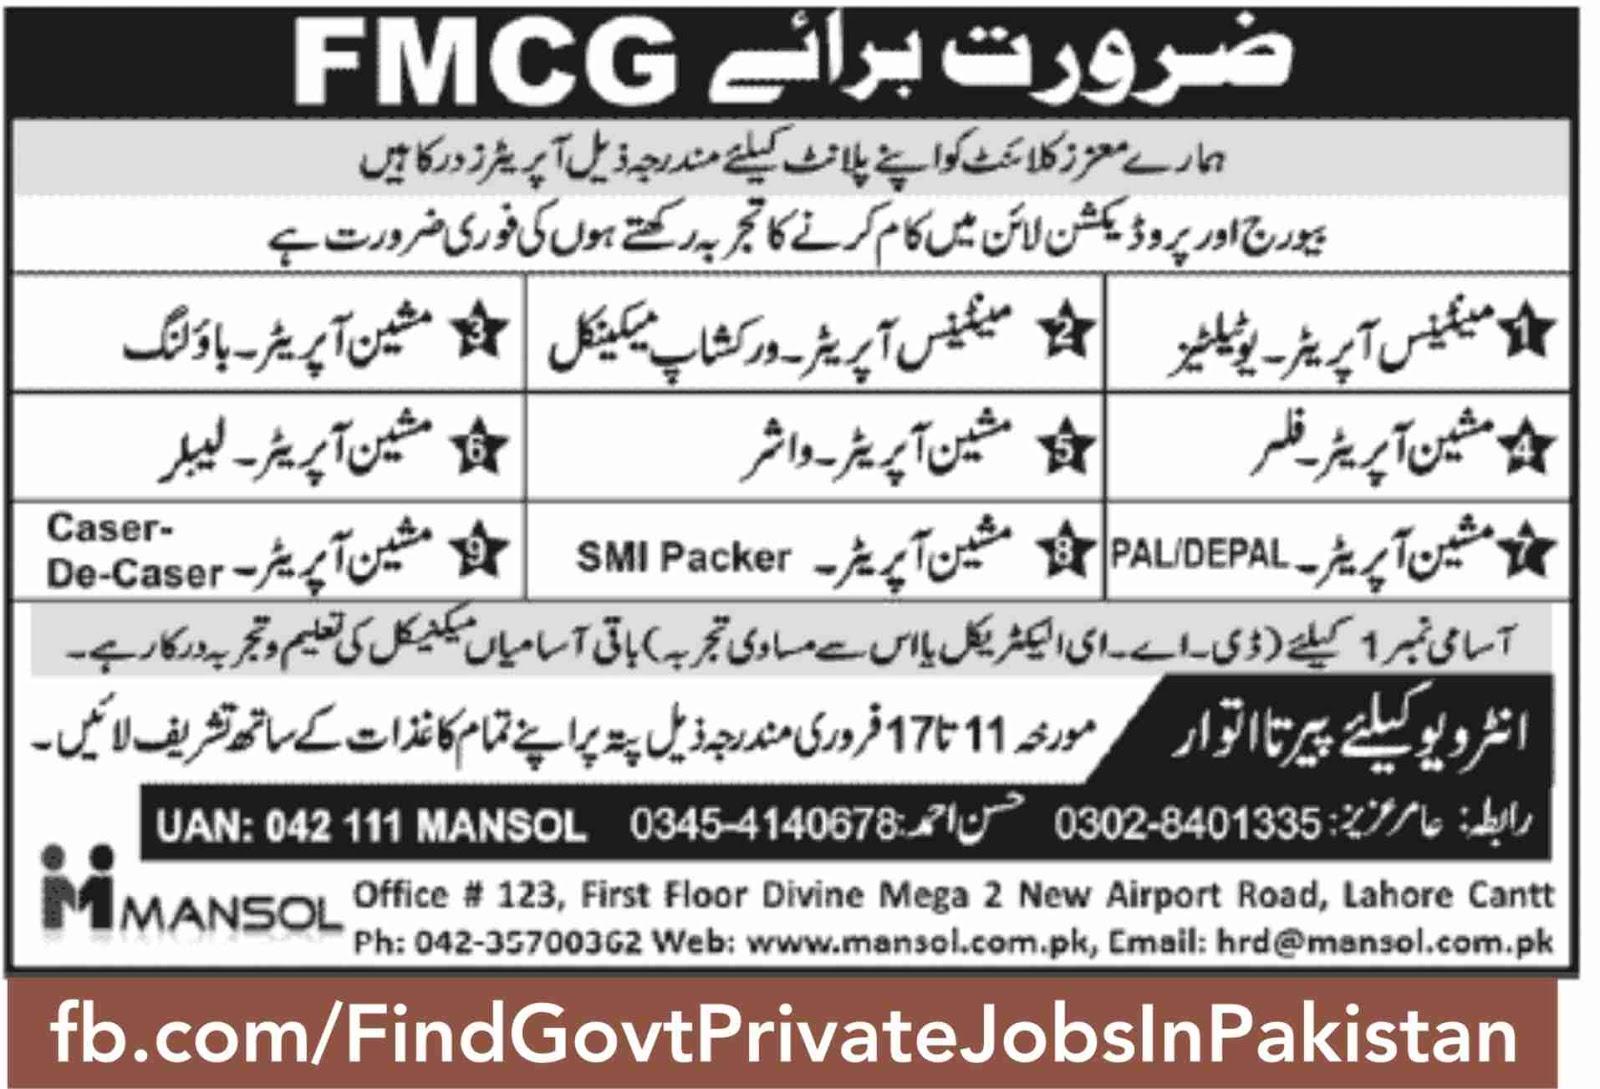 fmc job ads